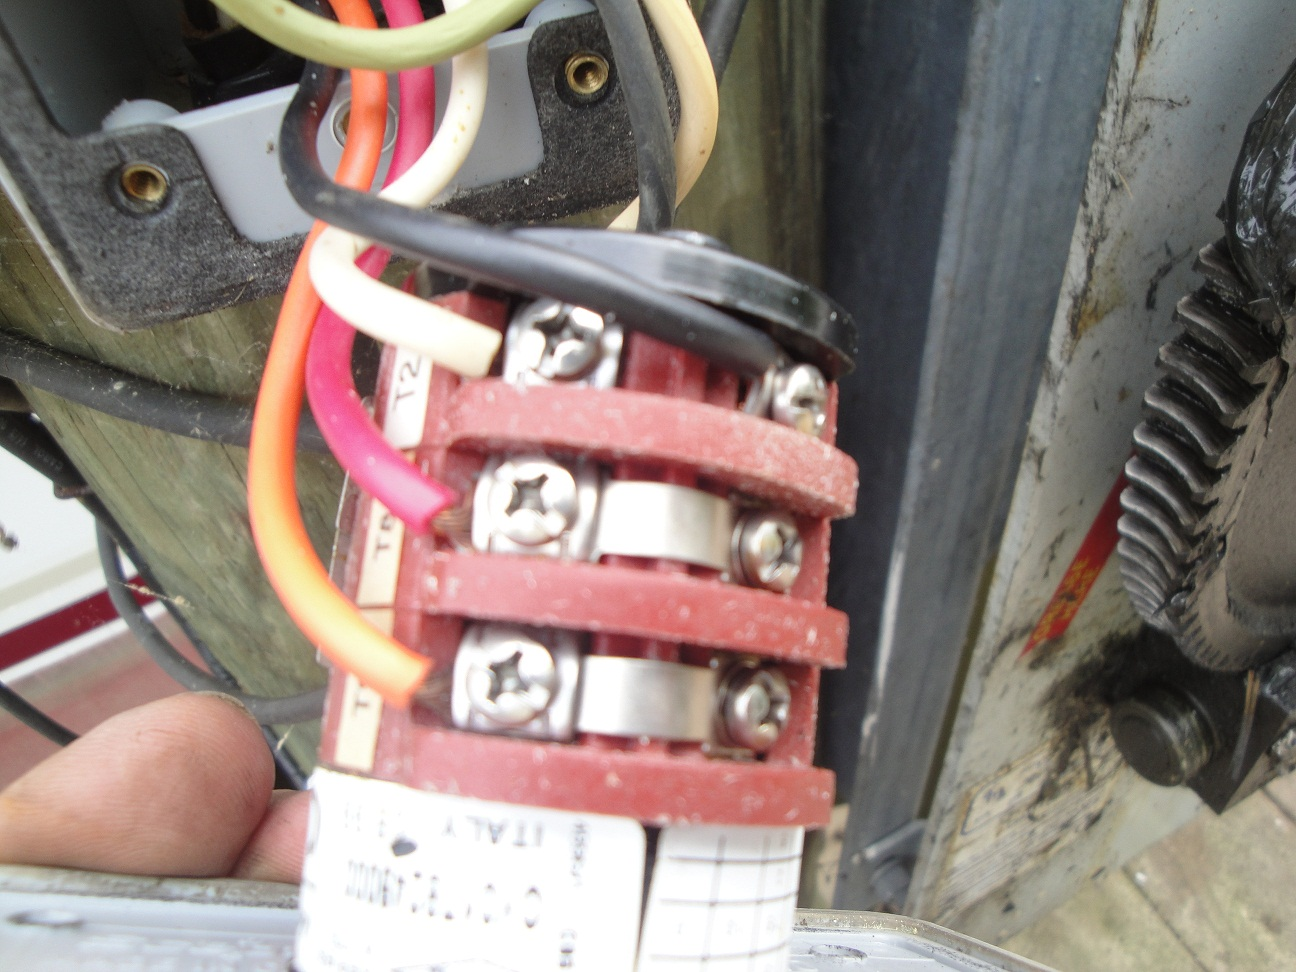 Motor Wiring Diagram Boat Lift Motor Wiring Diagrams 240 Volt Motor